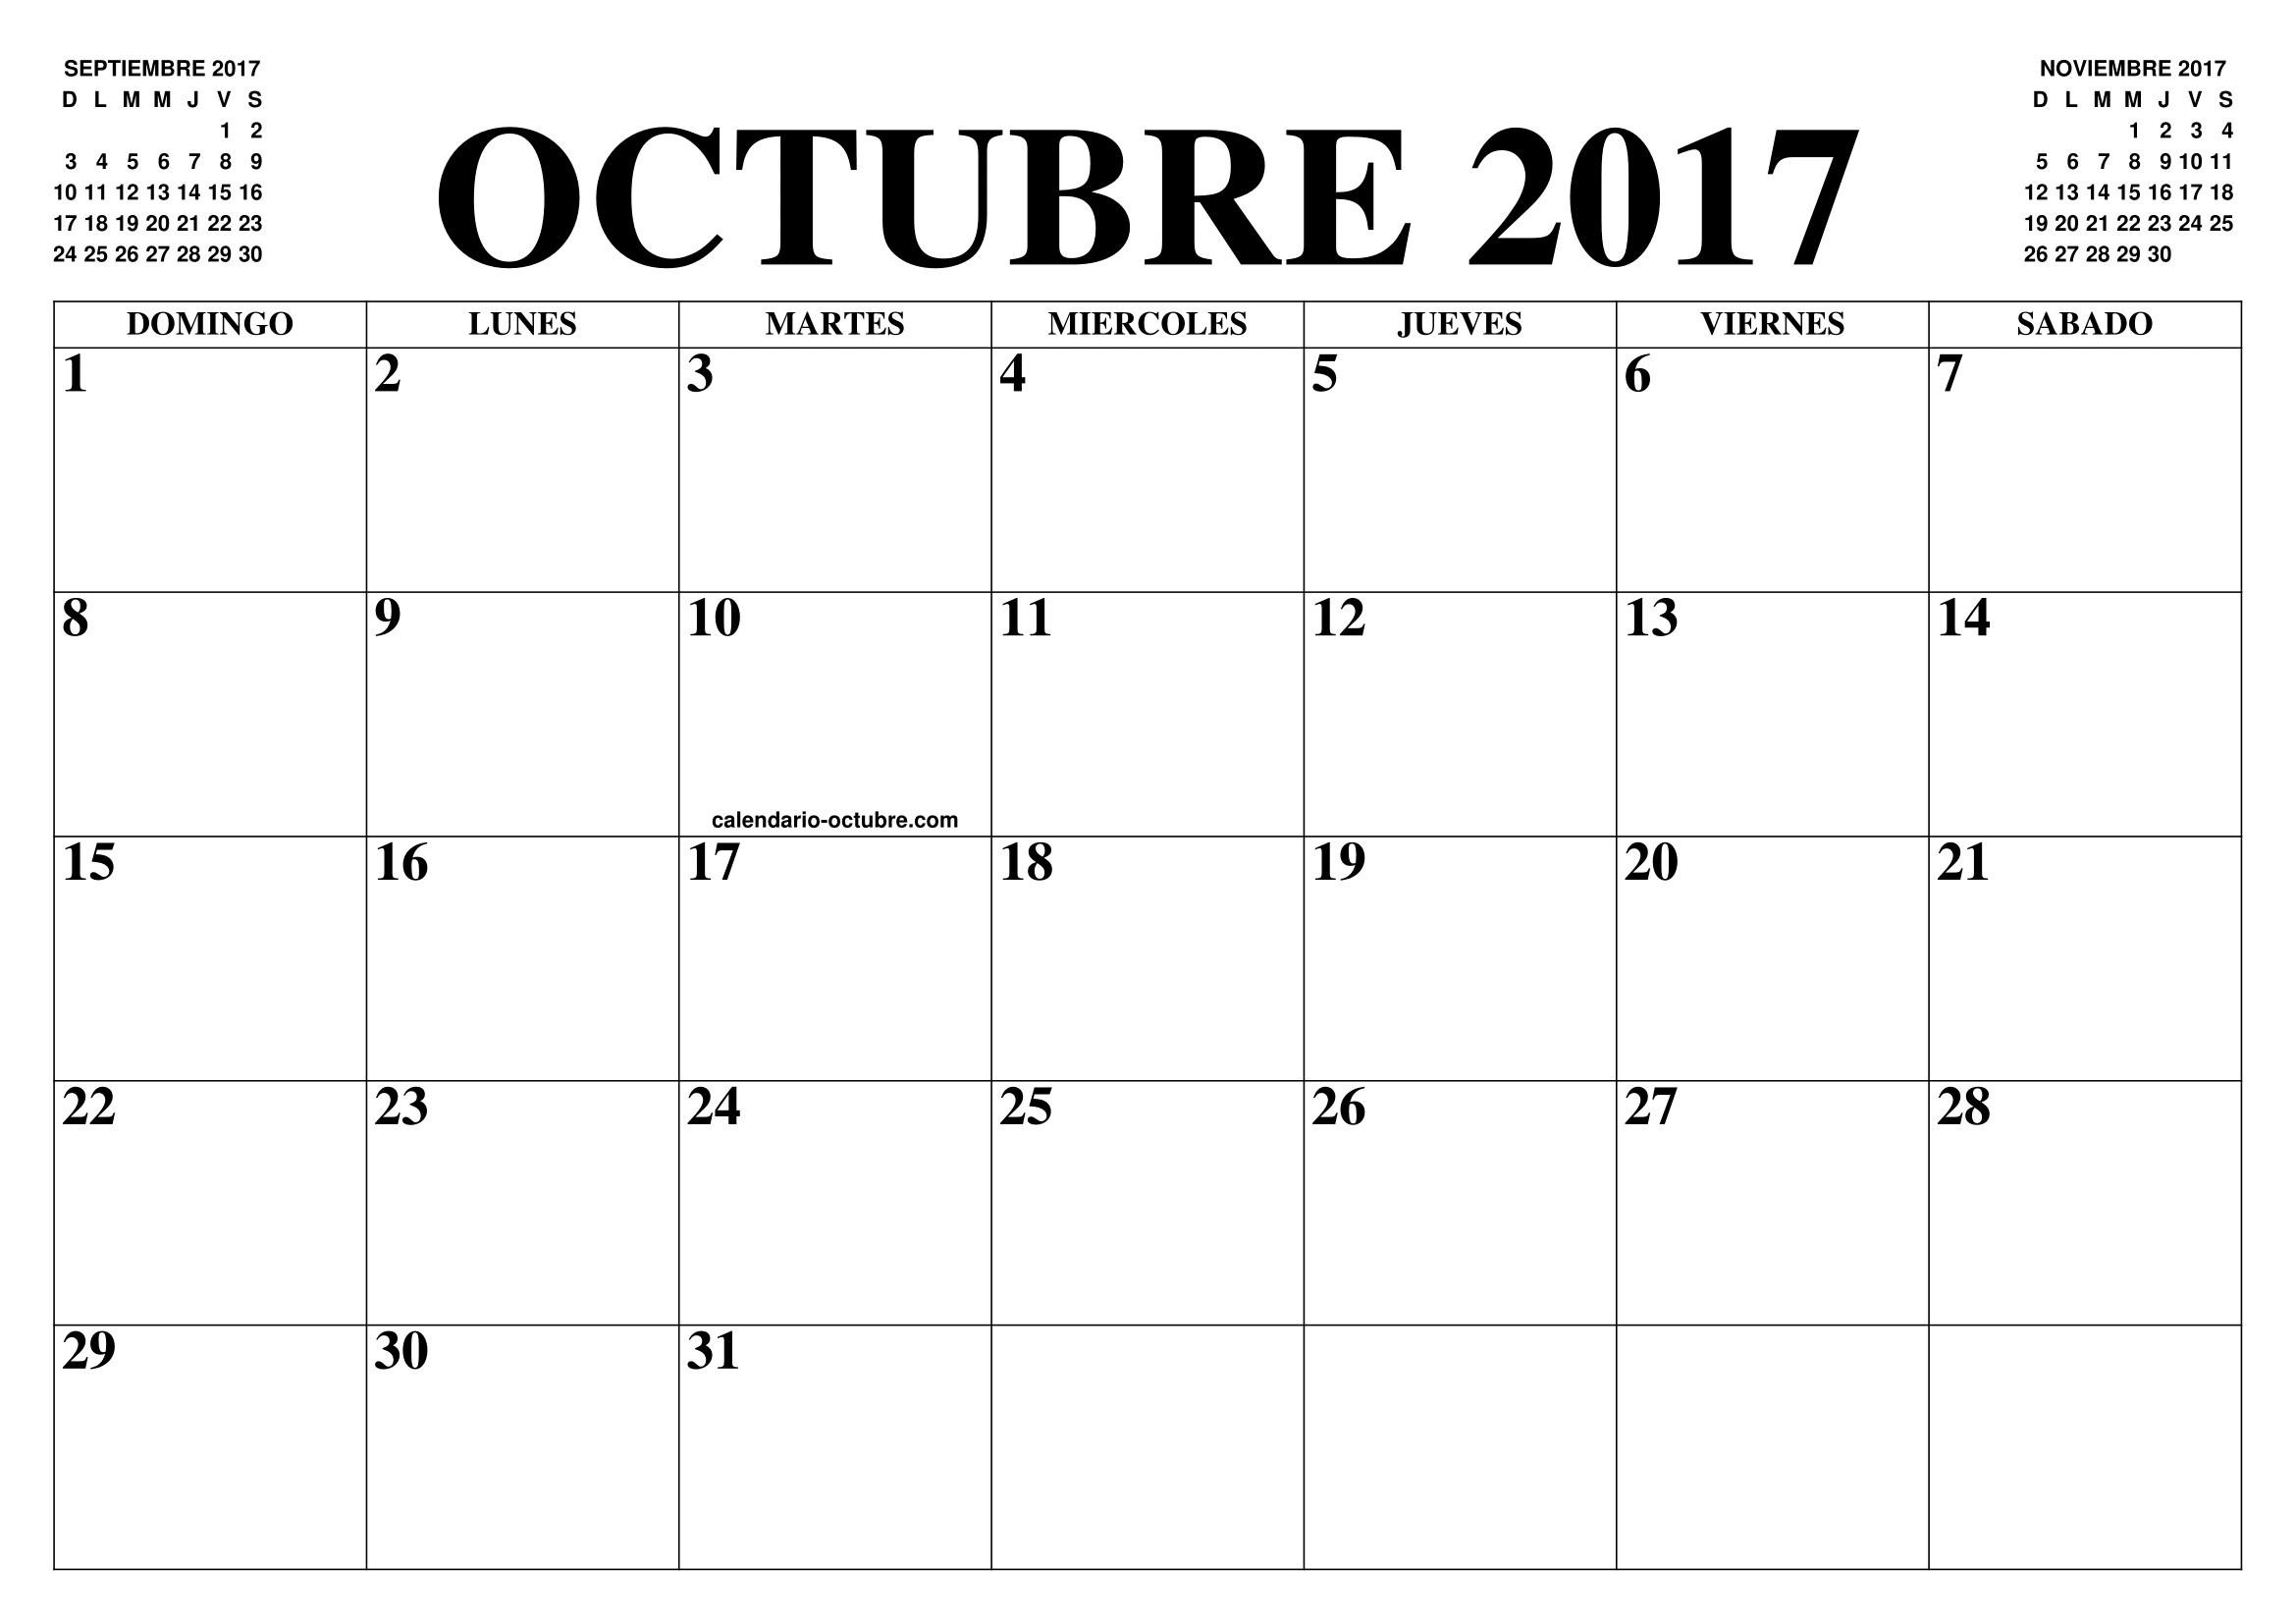 Calendario octubre el calendario octubre para imprimir gratis mes ano agenda agosto michel png 2339x1654 Paraimprimirgratis